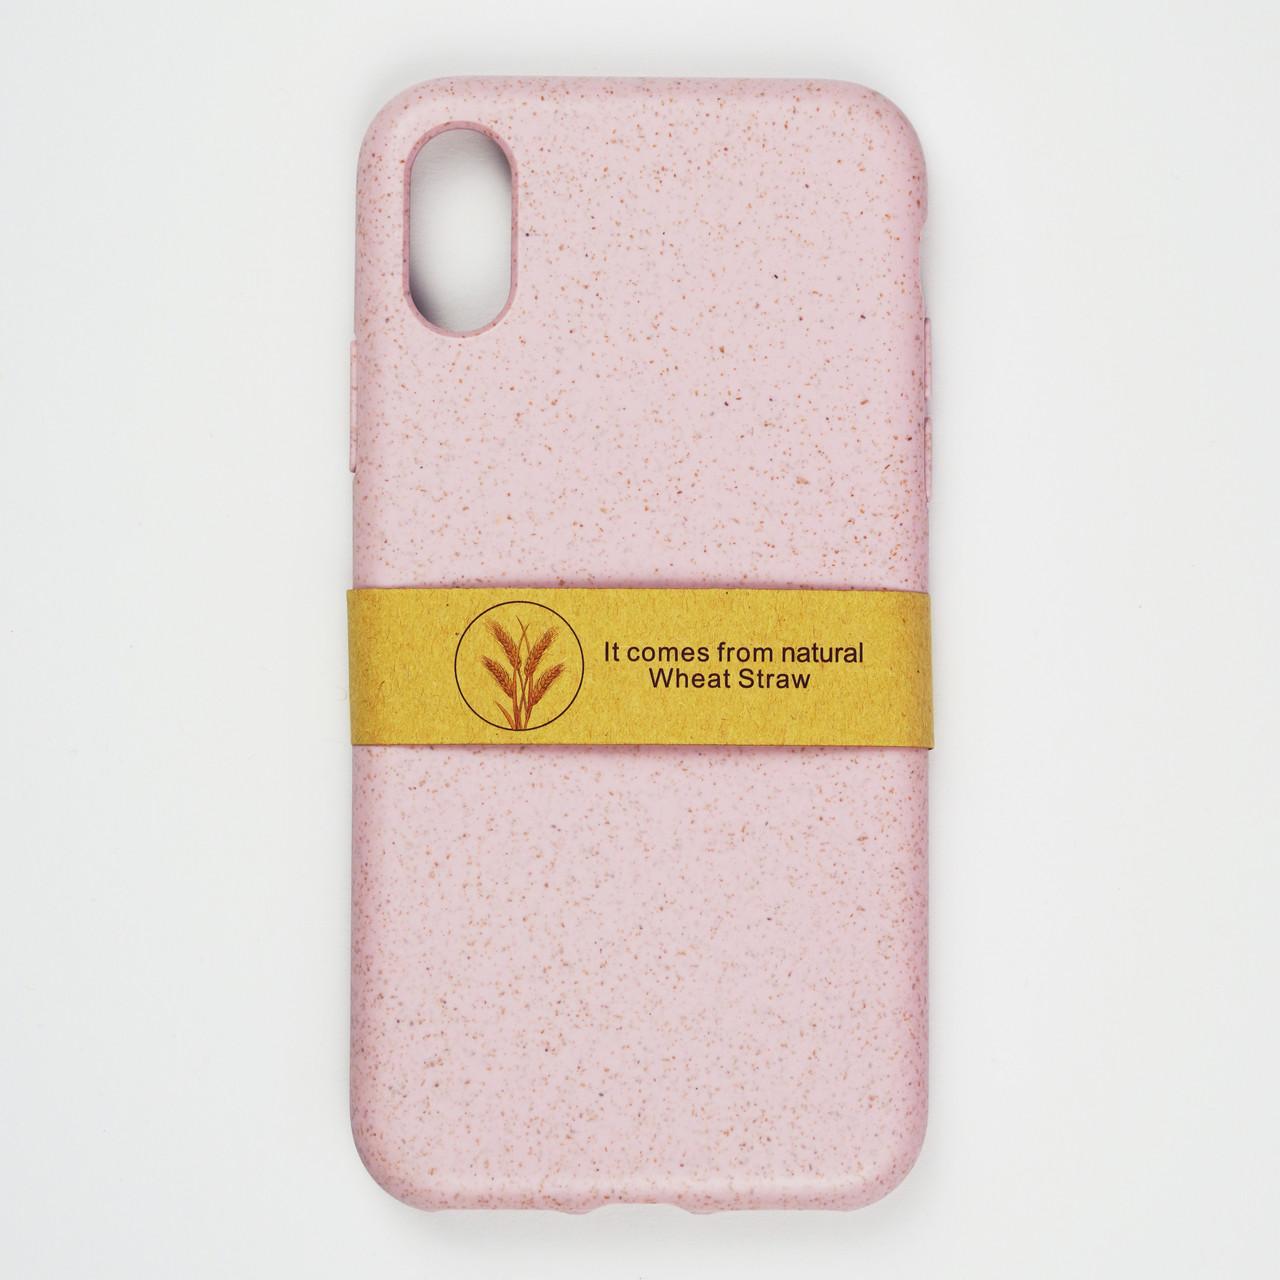 Биоразлагаемый чехол ECO Wheat Straw для iPhone Xs Max Pink